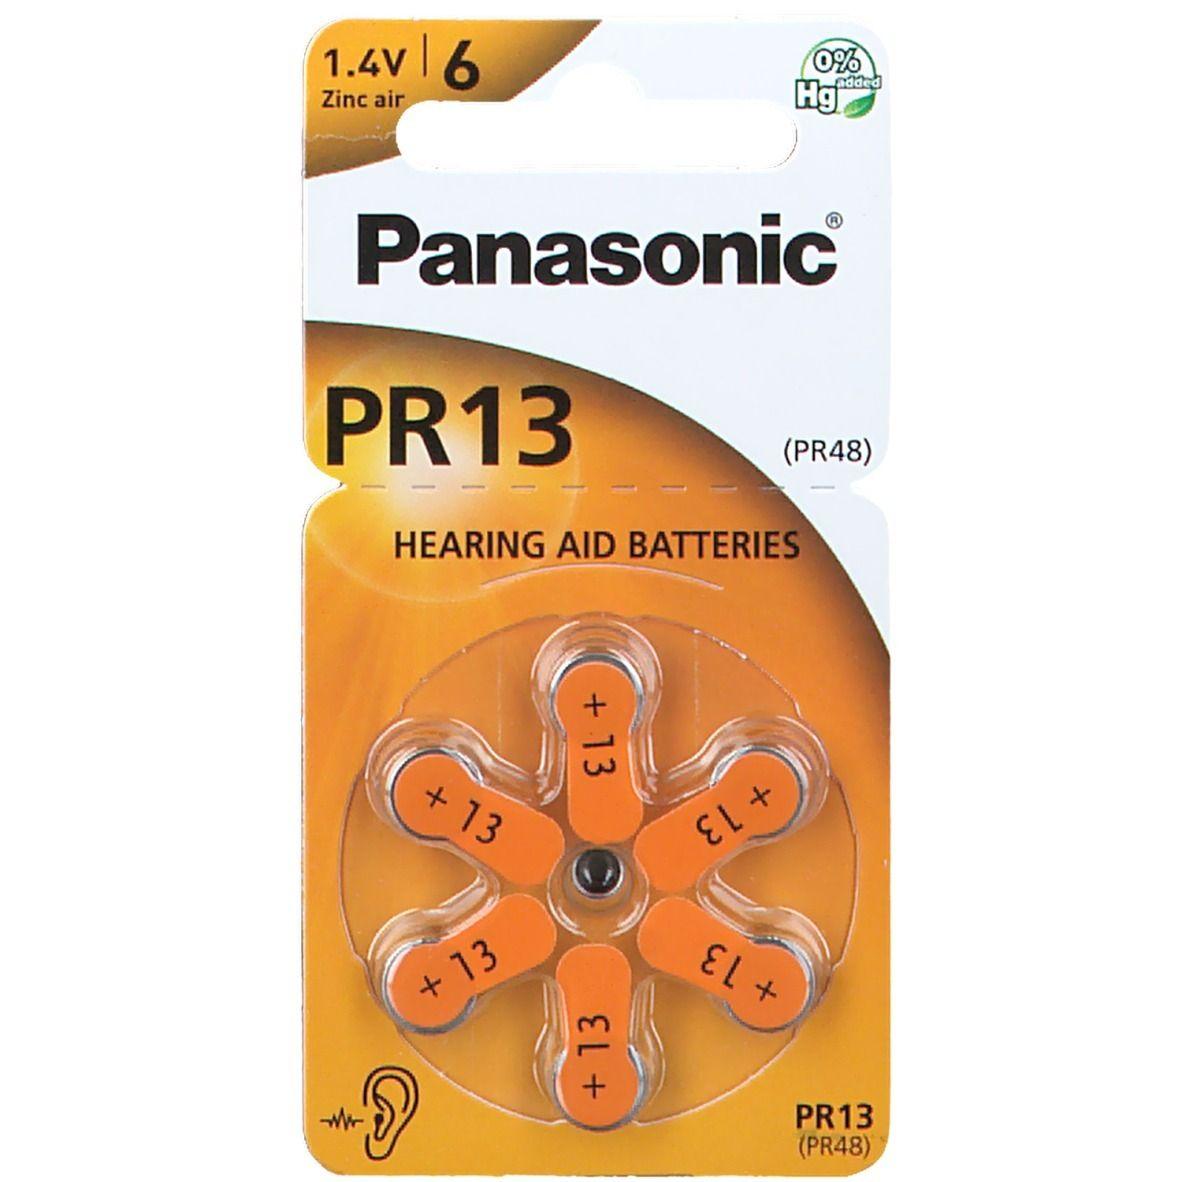 Batterien für Hörgerät Panasonic PR 13